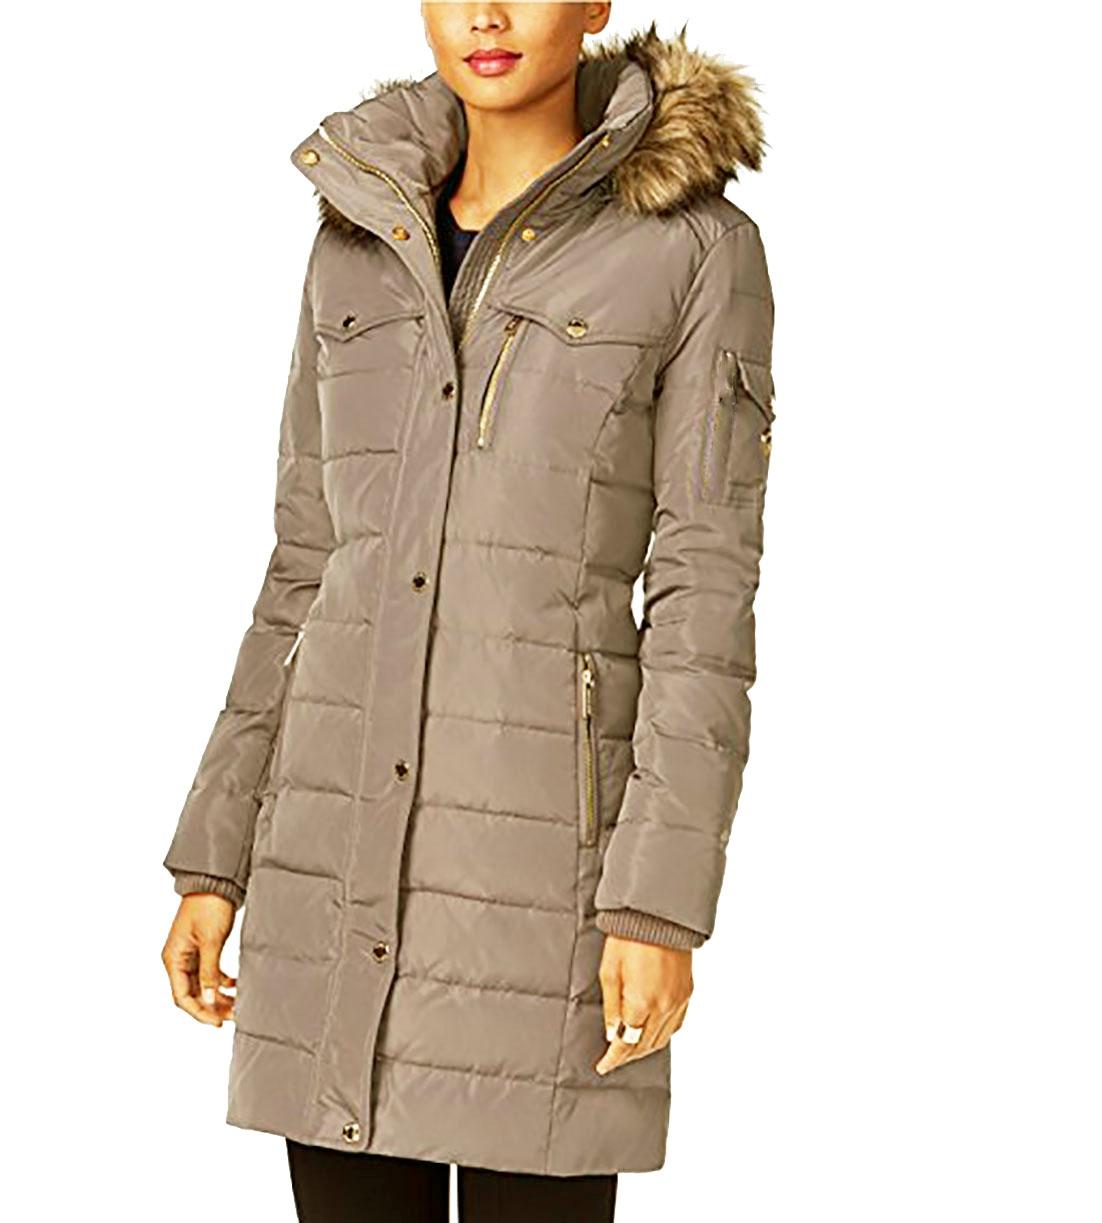 e0dcfae05 MICHAEL KORS Faux Fur Trim Down Puffer Coat — Zooloo LeatherZooloo Leather